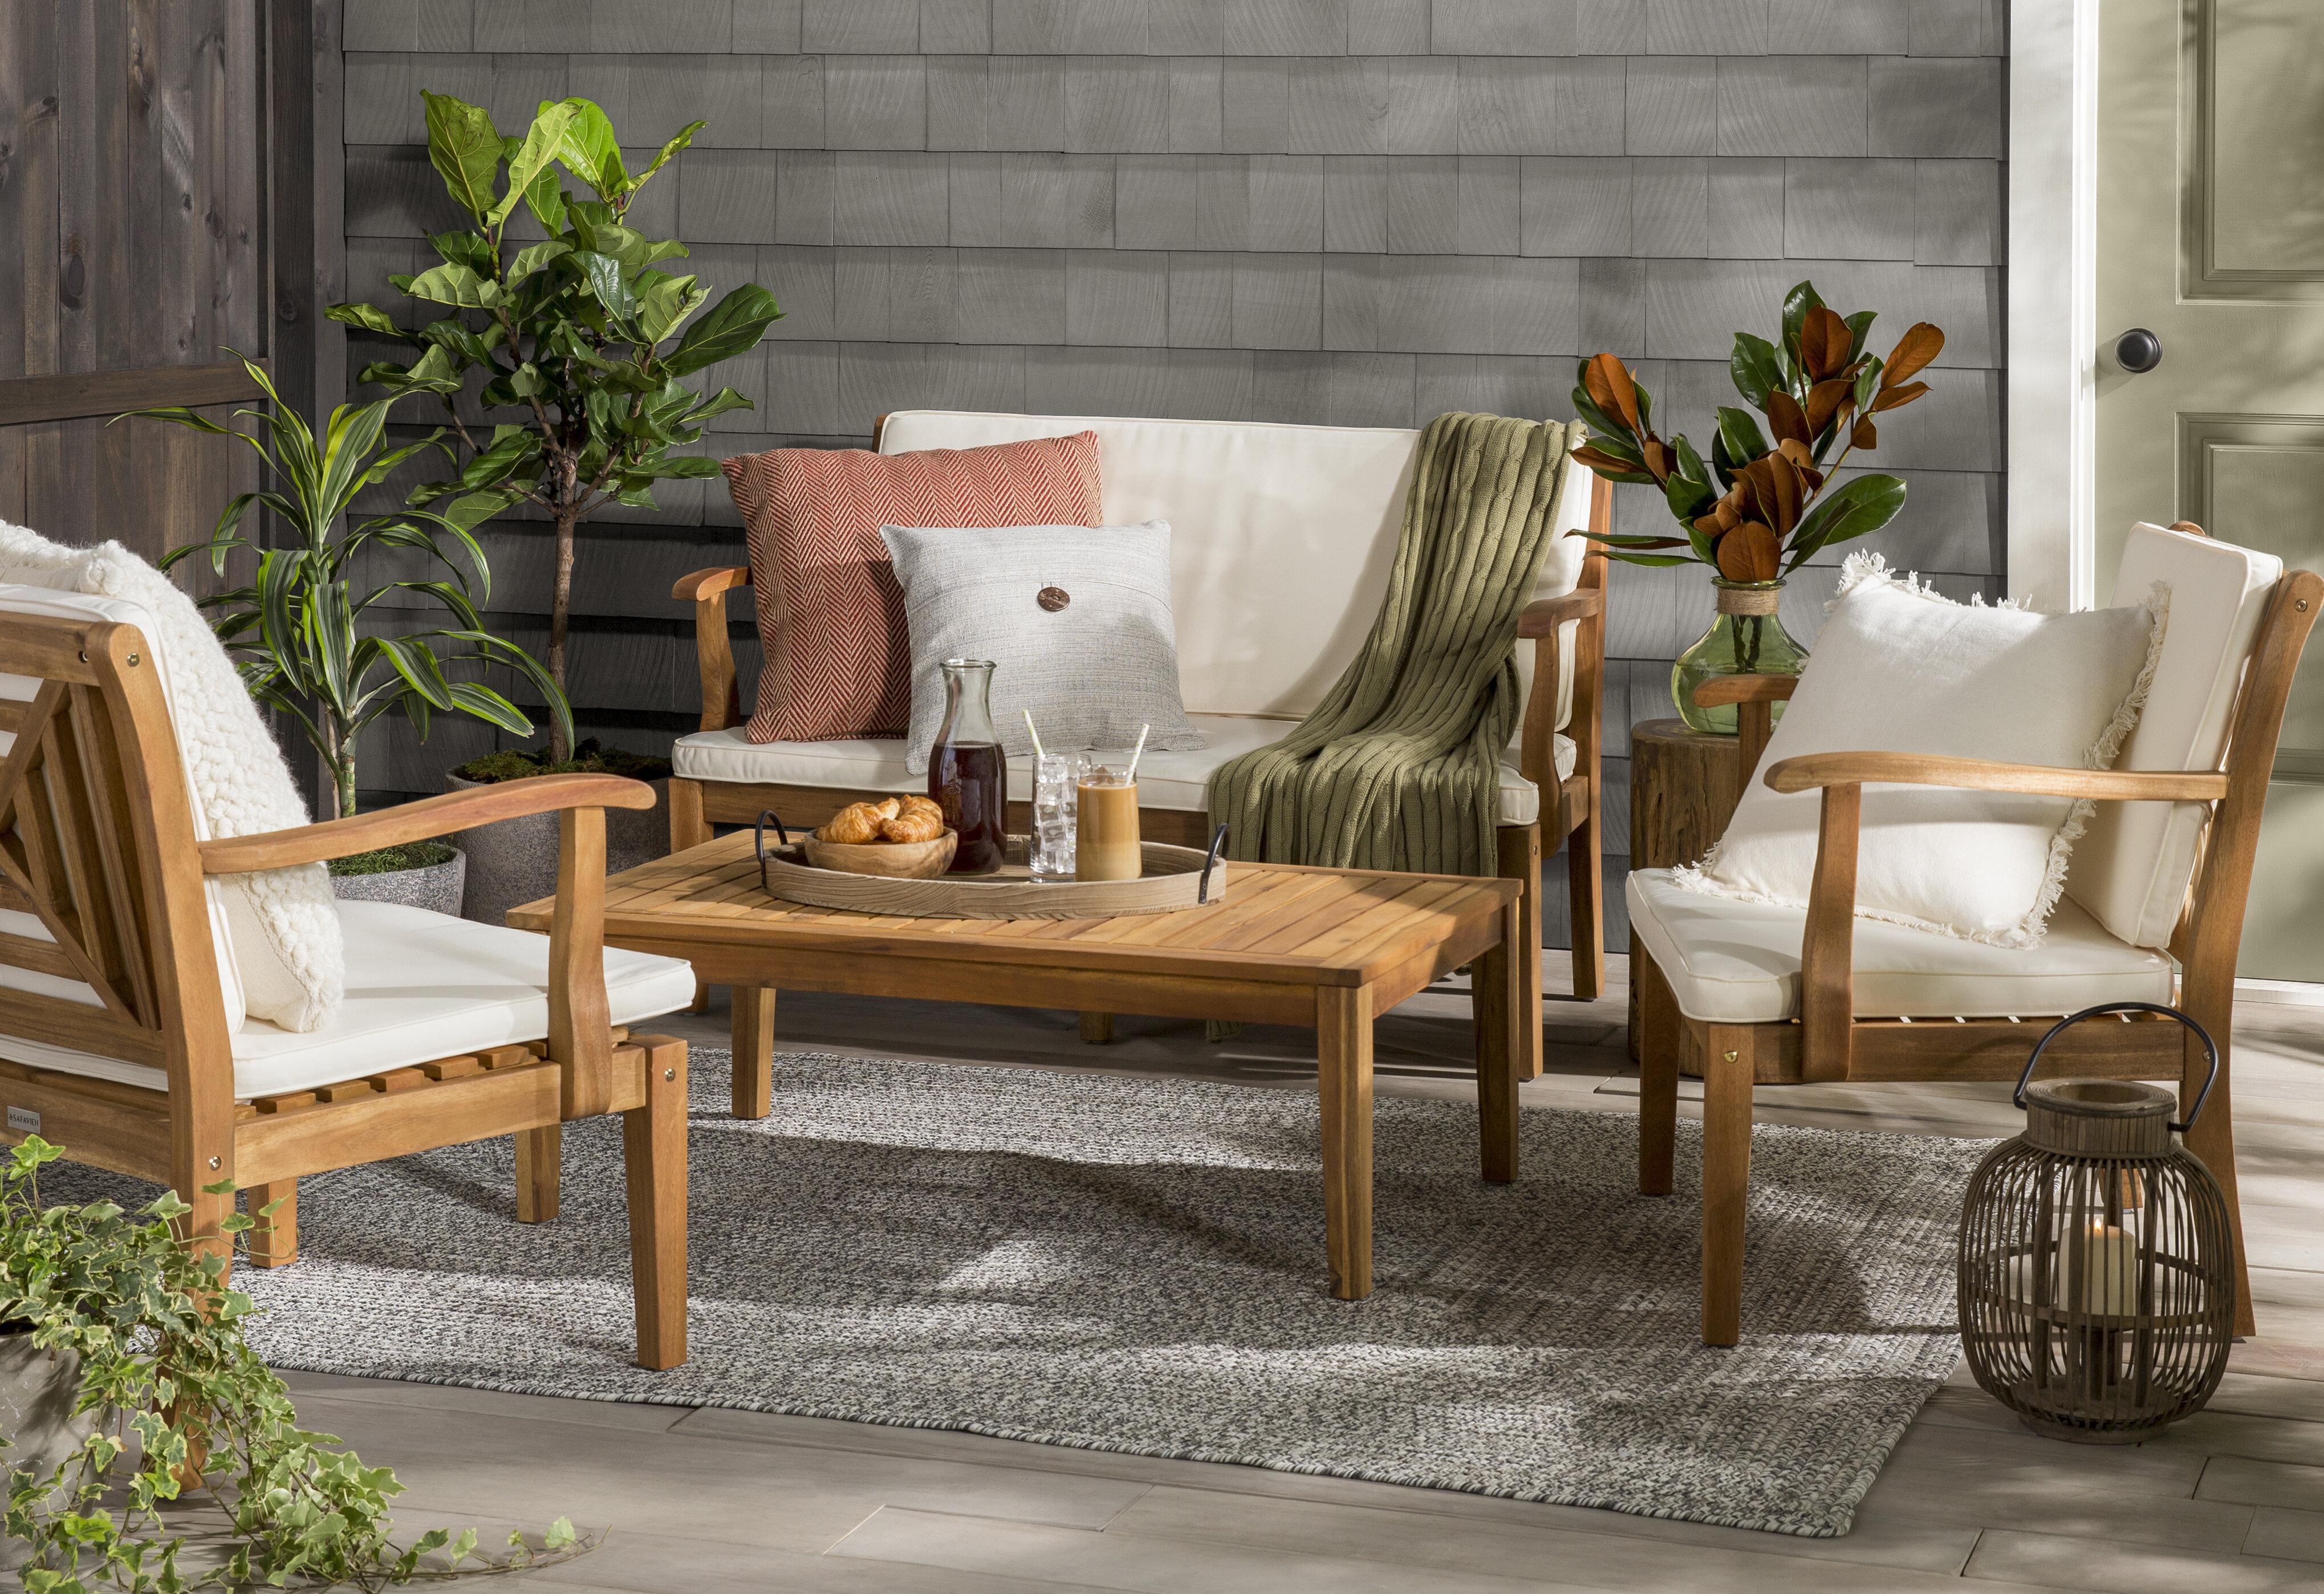 Highland Dunes Tullia 4 Piece Conversation Set With Cushions U0026 Reviews |  Wayfair